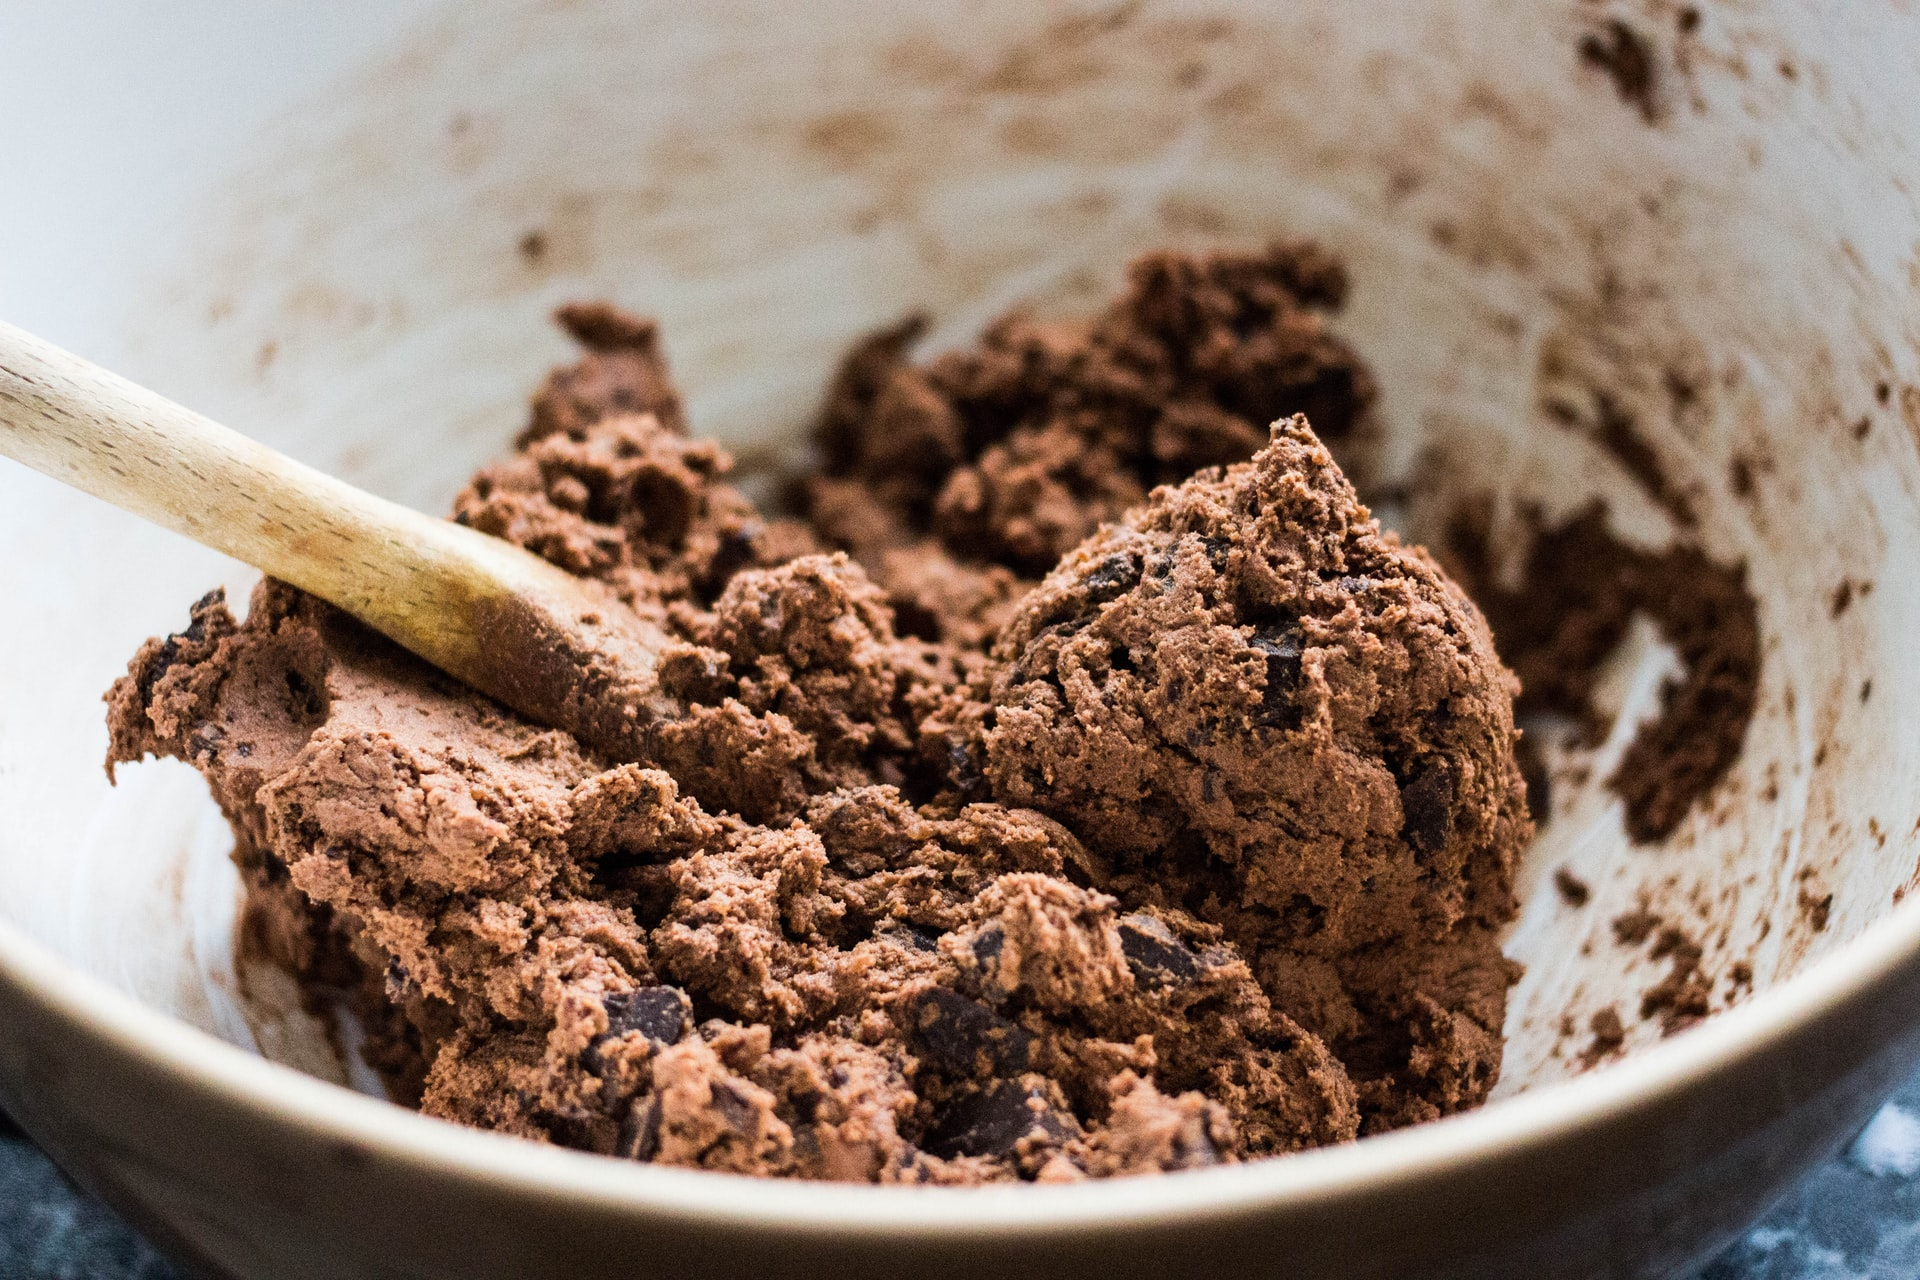 charisse kenion vFMJNZz3x9E unsplash 1 - Süße Verführung - vegane Schoko-Cookies